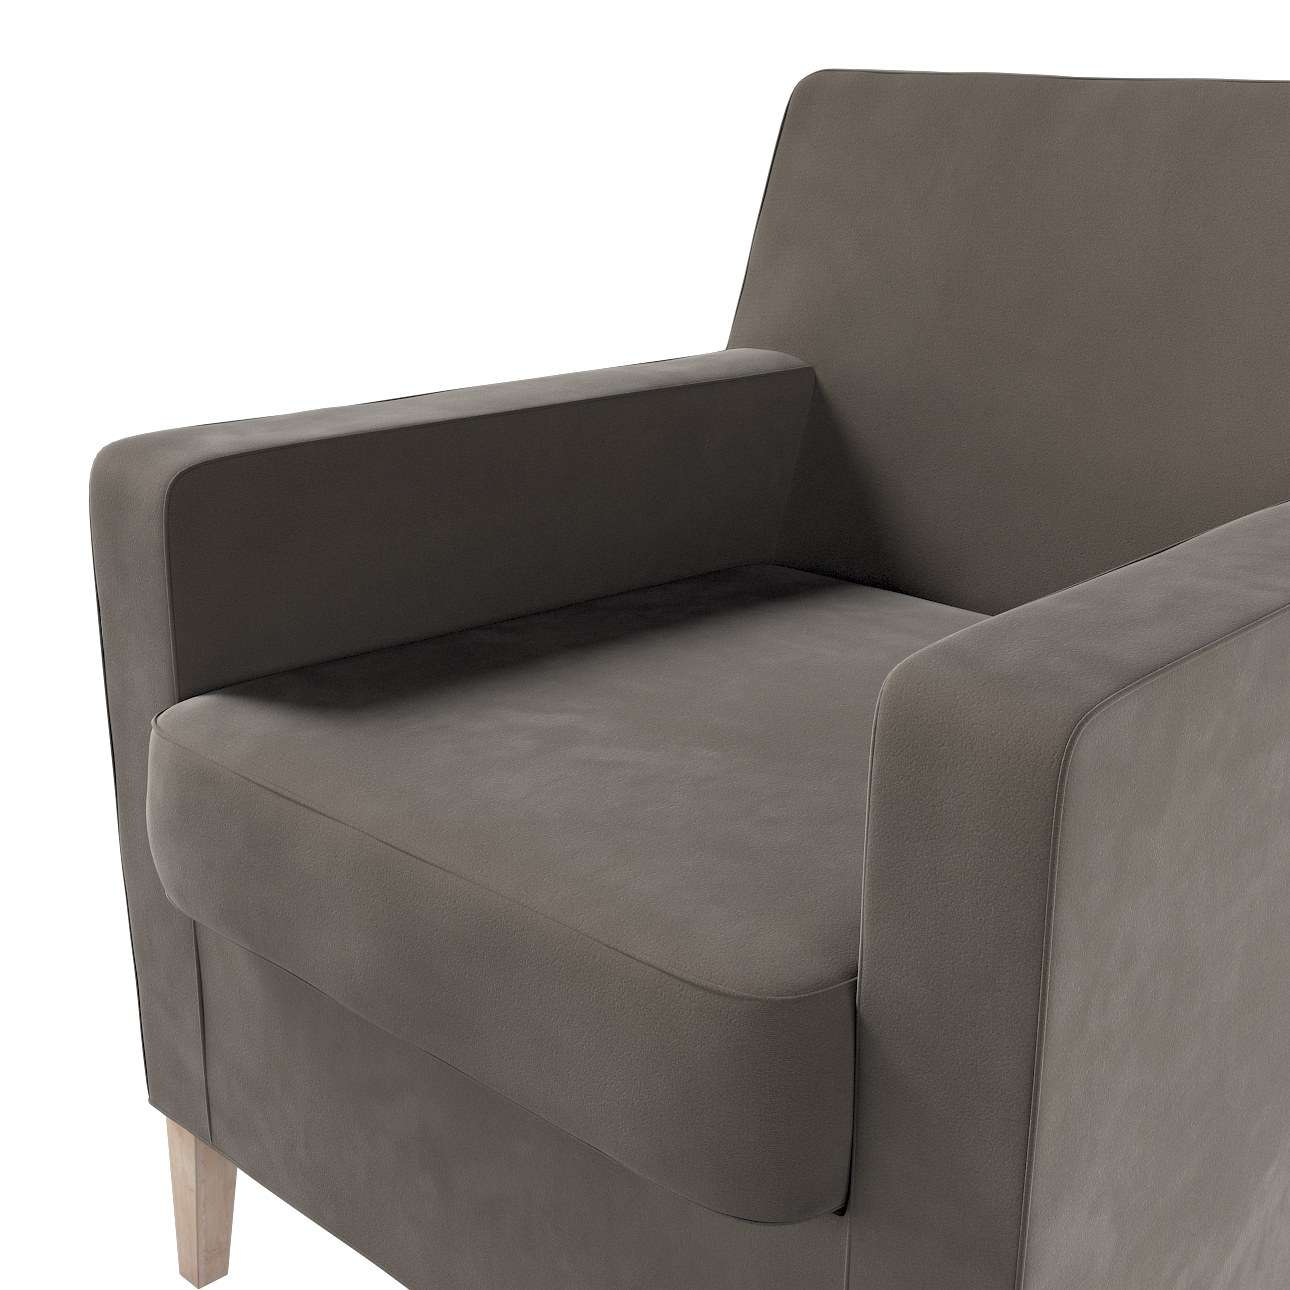 Pokrowiec na fotel Karlstad w kolekcji Velvet, tkanina: 704-19